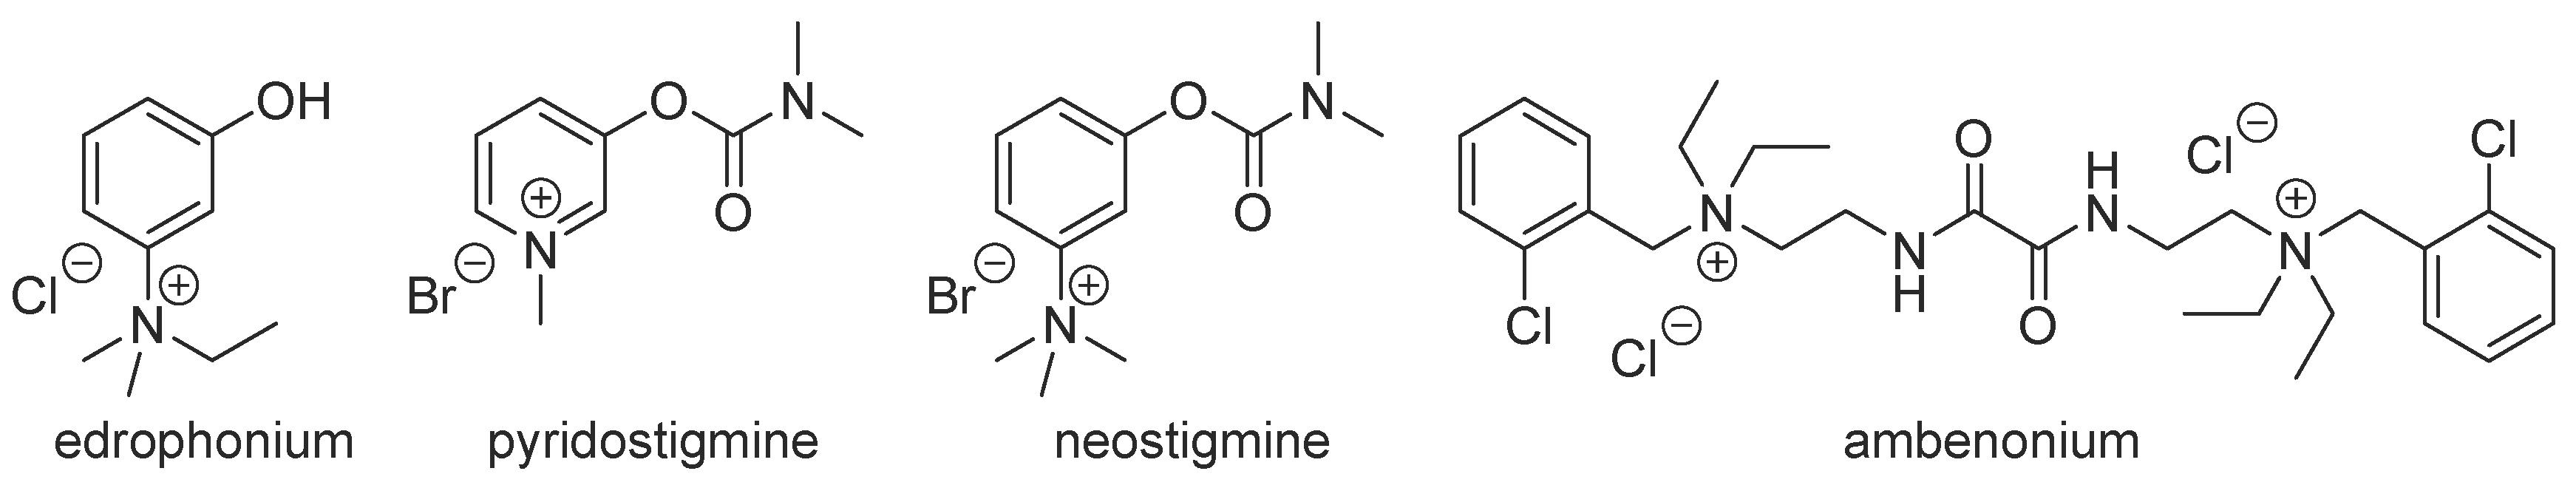 Molecules | Free Full-Text | Increasing Polarity in Tacrine